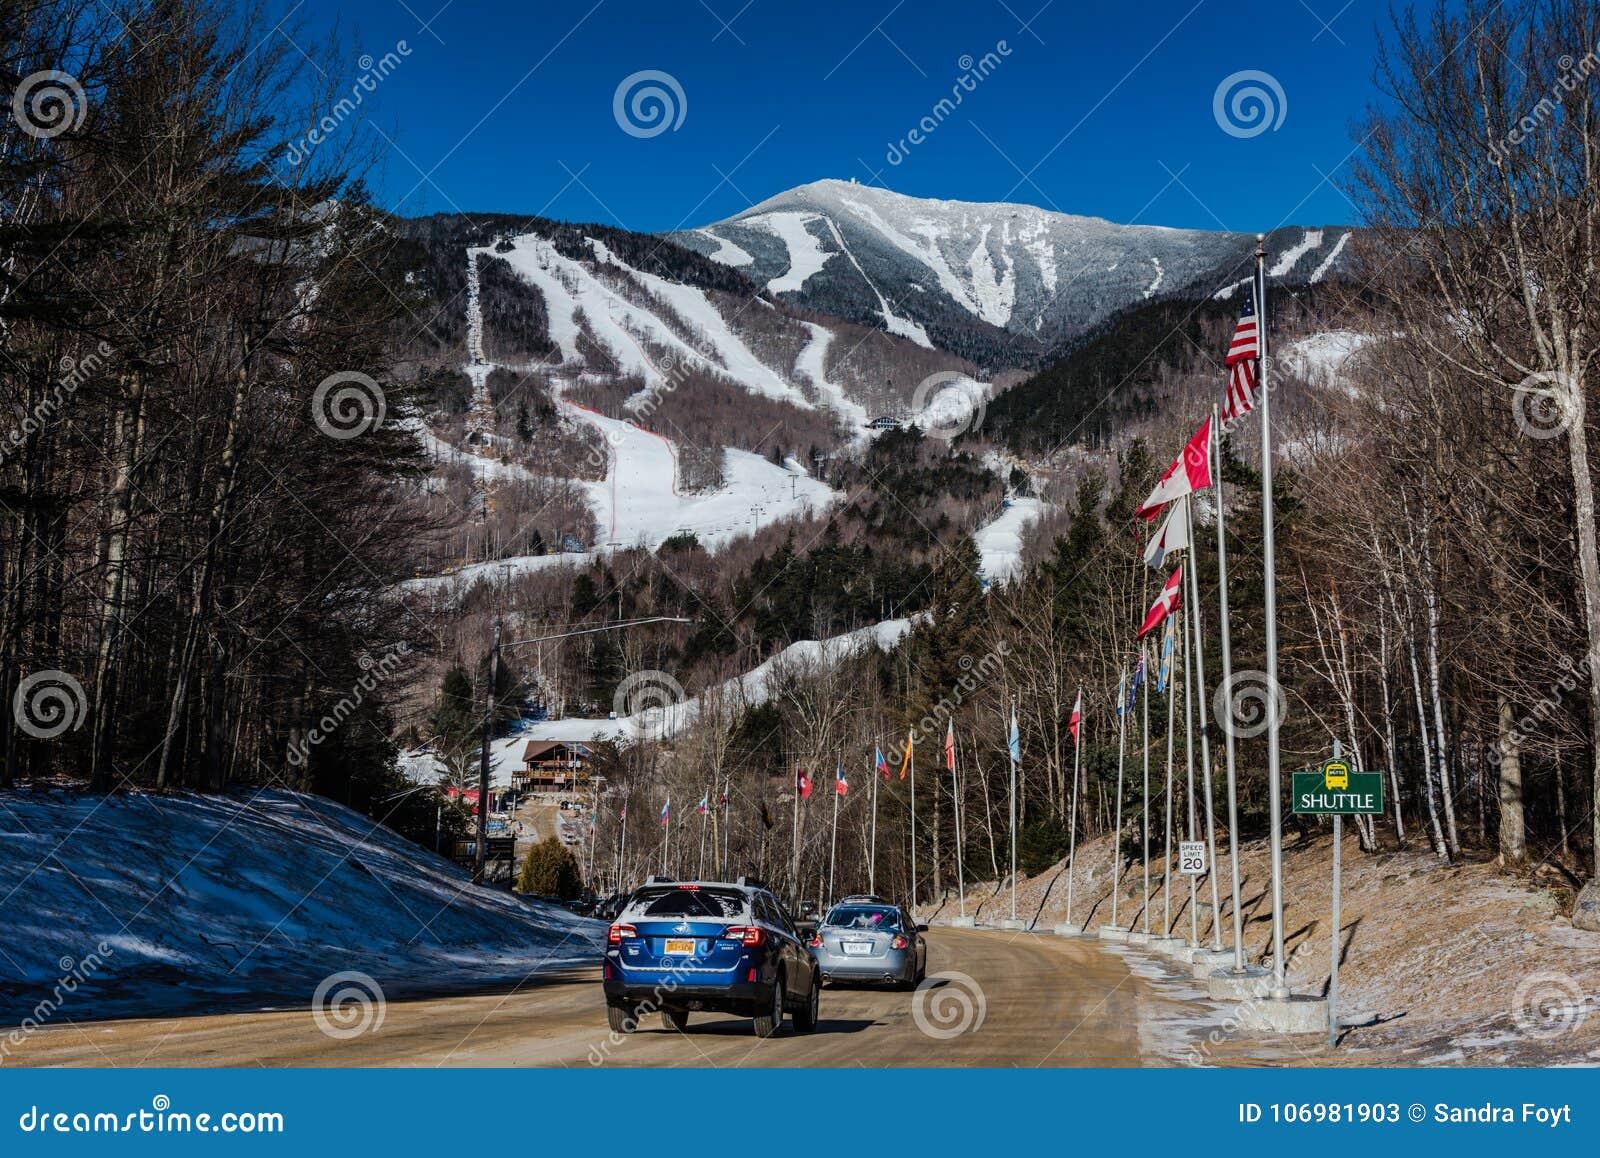 road to whiteface mountain ski resort editorial stock photo - image